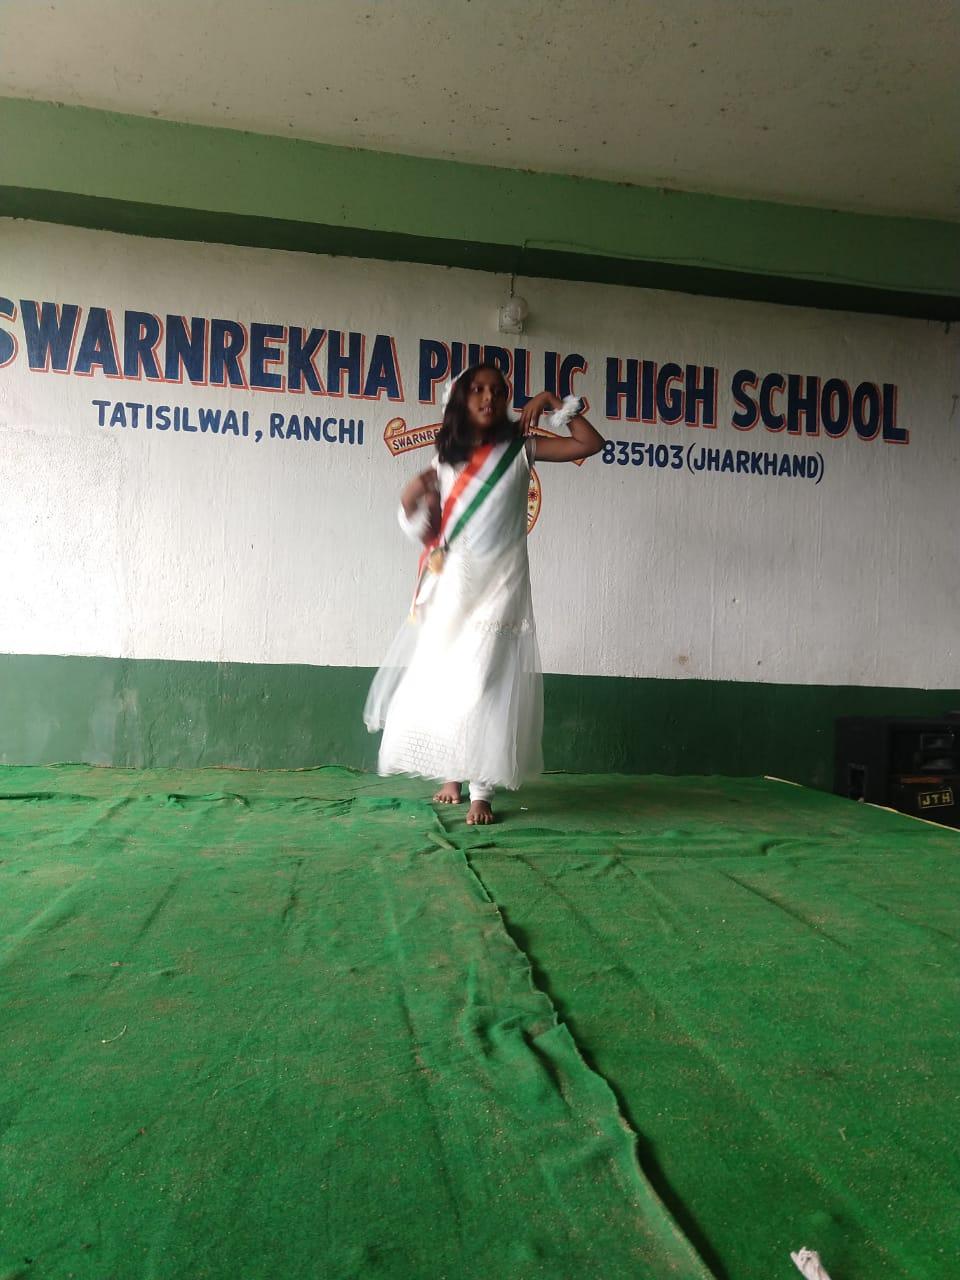 image 10 | Swarnrekha School | swarnrekhapublicschool.com